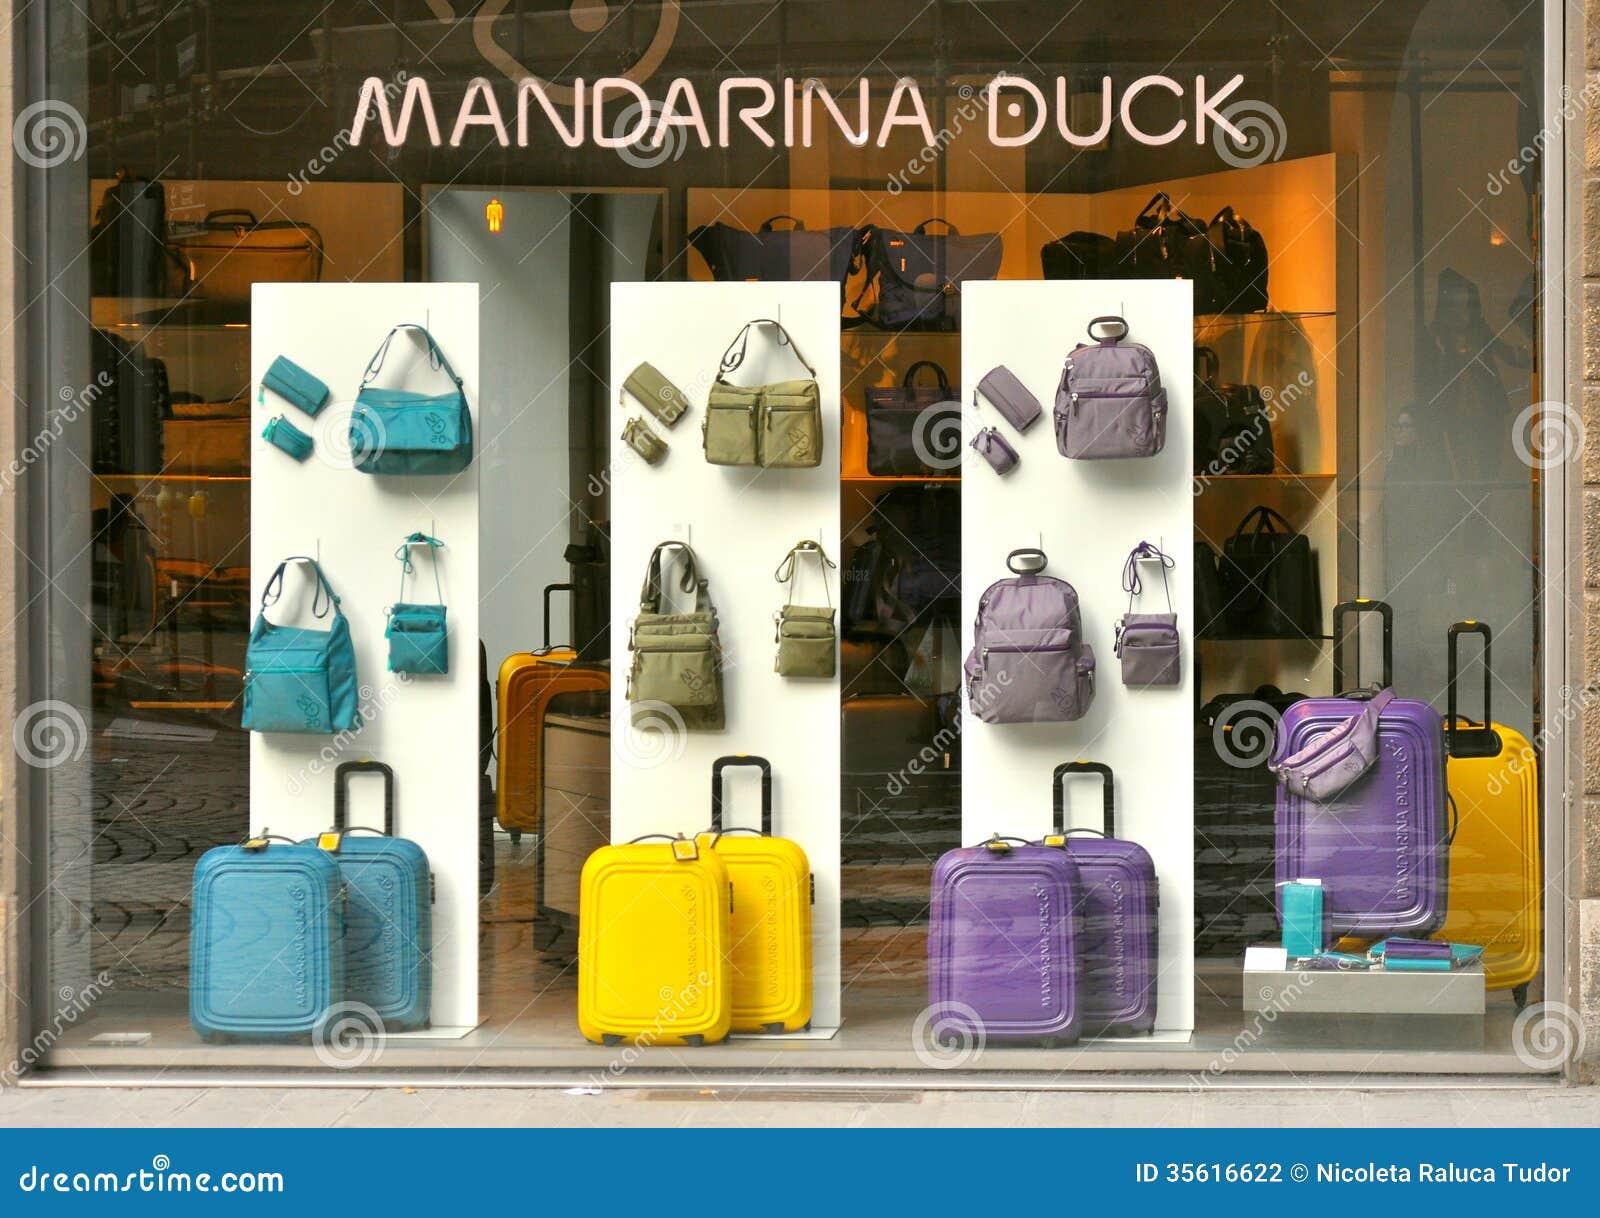 Mandarina Duck Bag Fashion Shop In Italy Editorial Photography ...